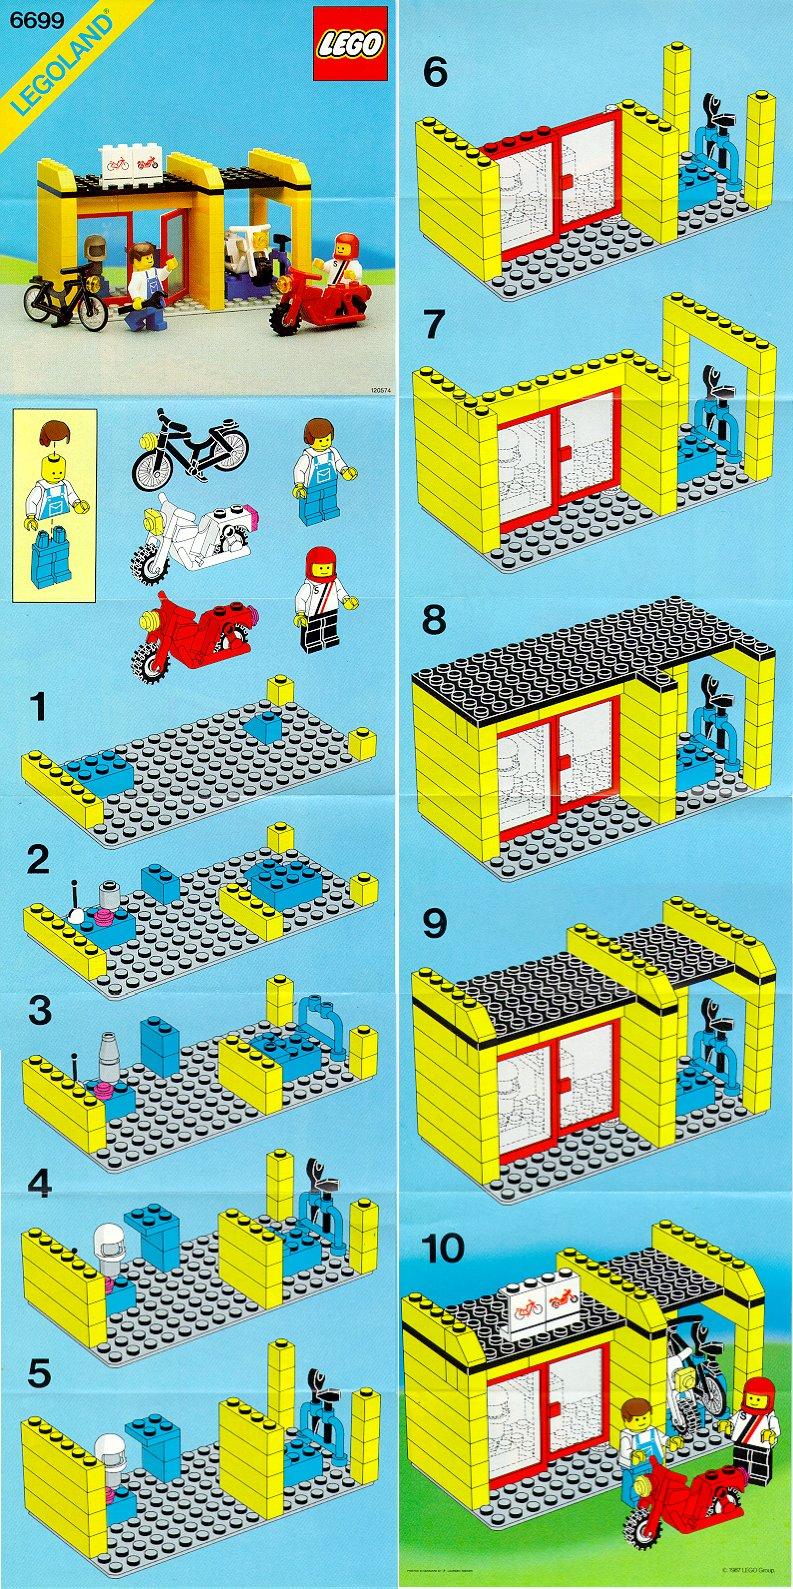 Cycle Fix-it Shop